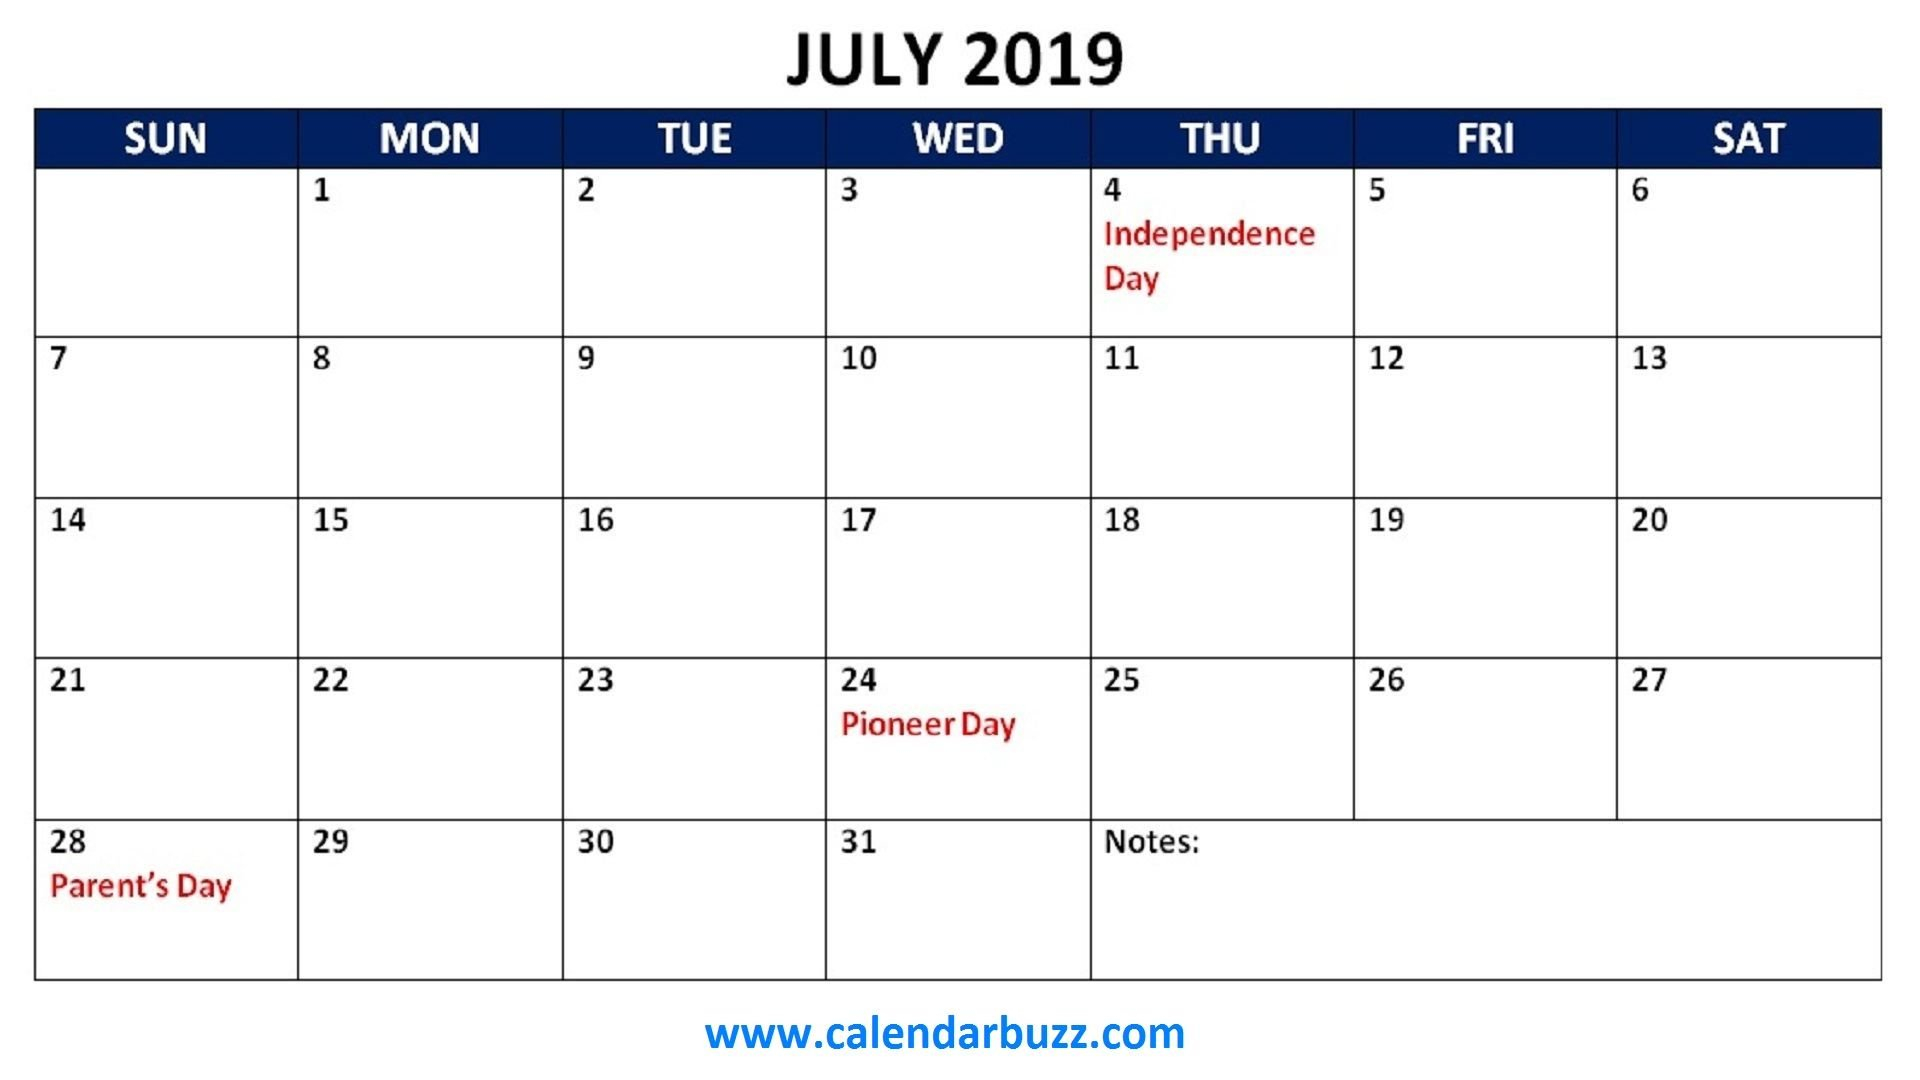 July 2019 Holidays Calendar #july #julycalendar #july2019 | July Calendar Q1 2019